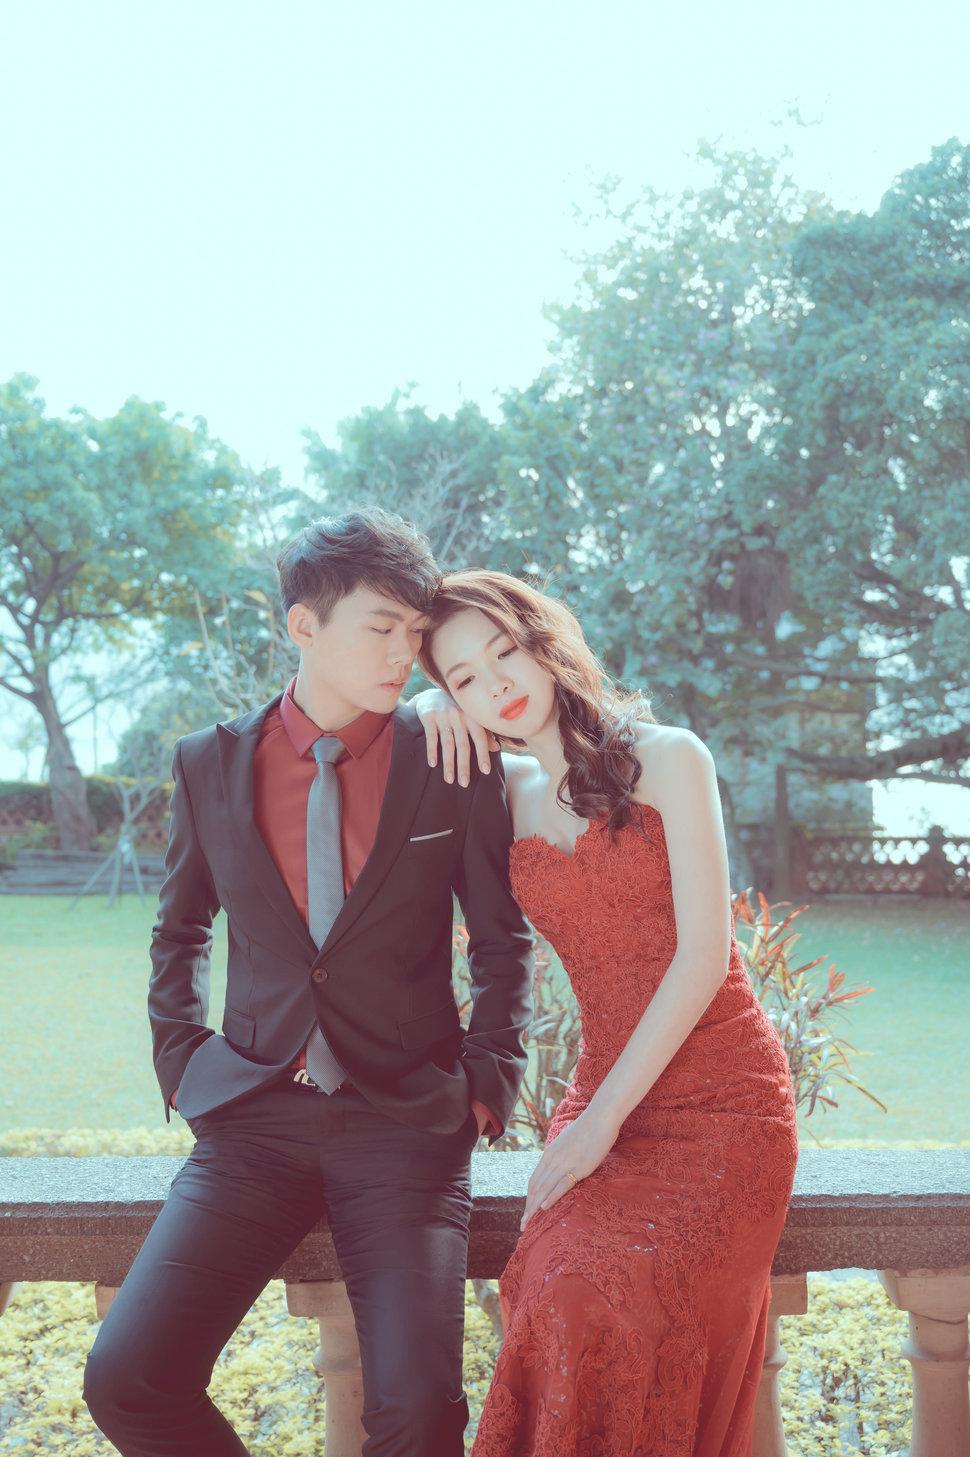 20200111-YEU_5604-1 - 花蓮婚紗 - Sposa Bella《結婚吧》